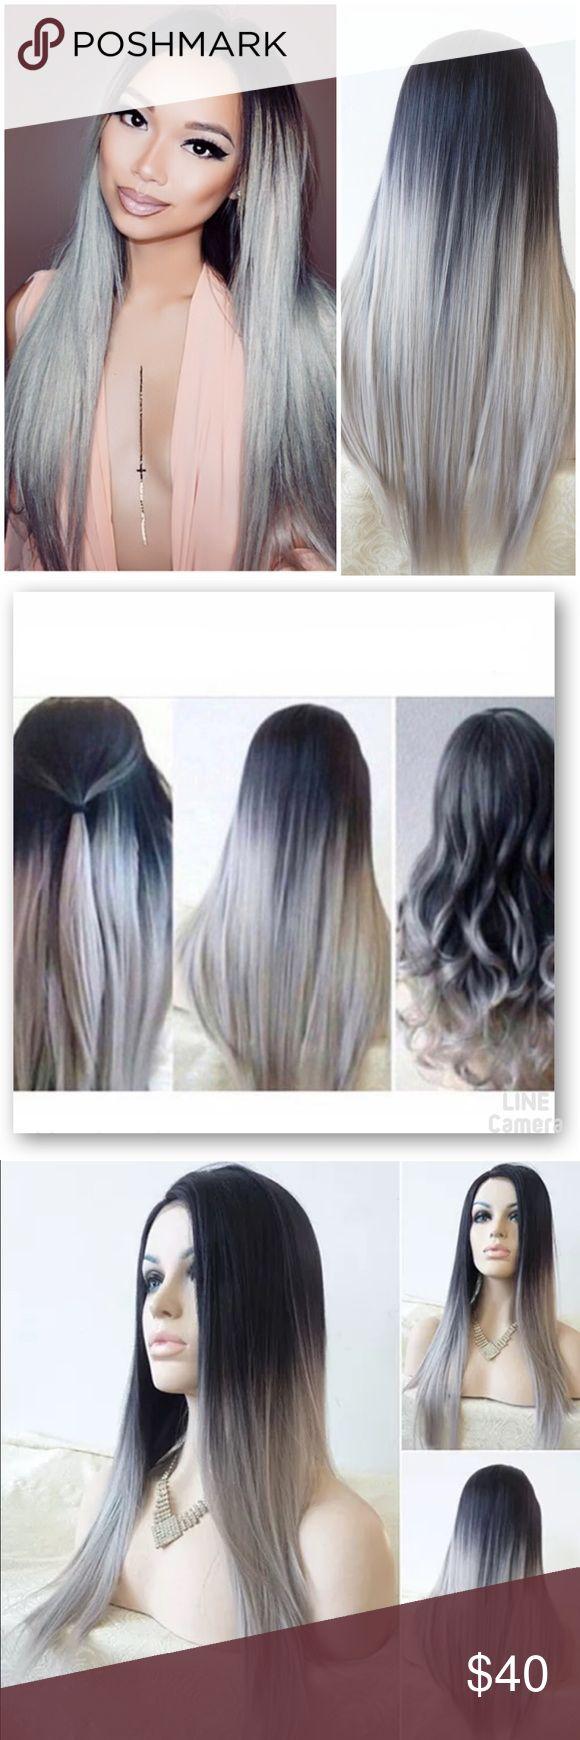 1000 Ideas About Straight Black Hair On Pinterest Long Hair Black Hair And Waterfall Braids